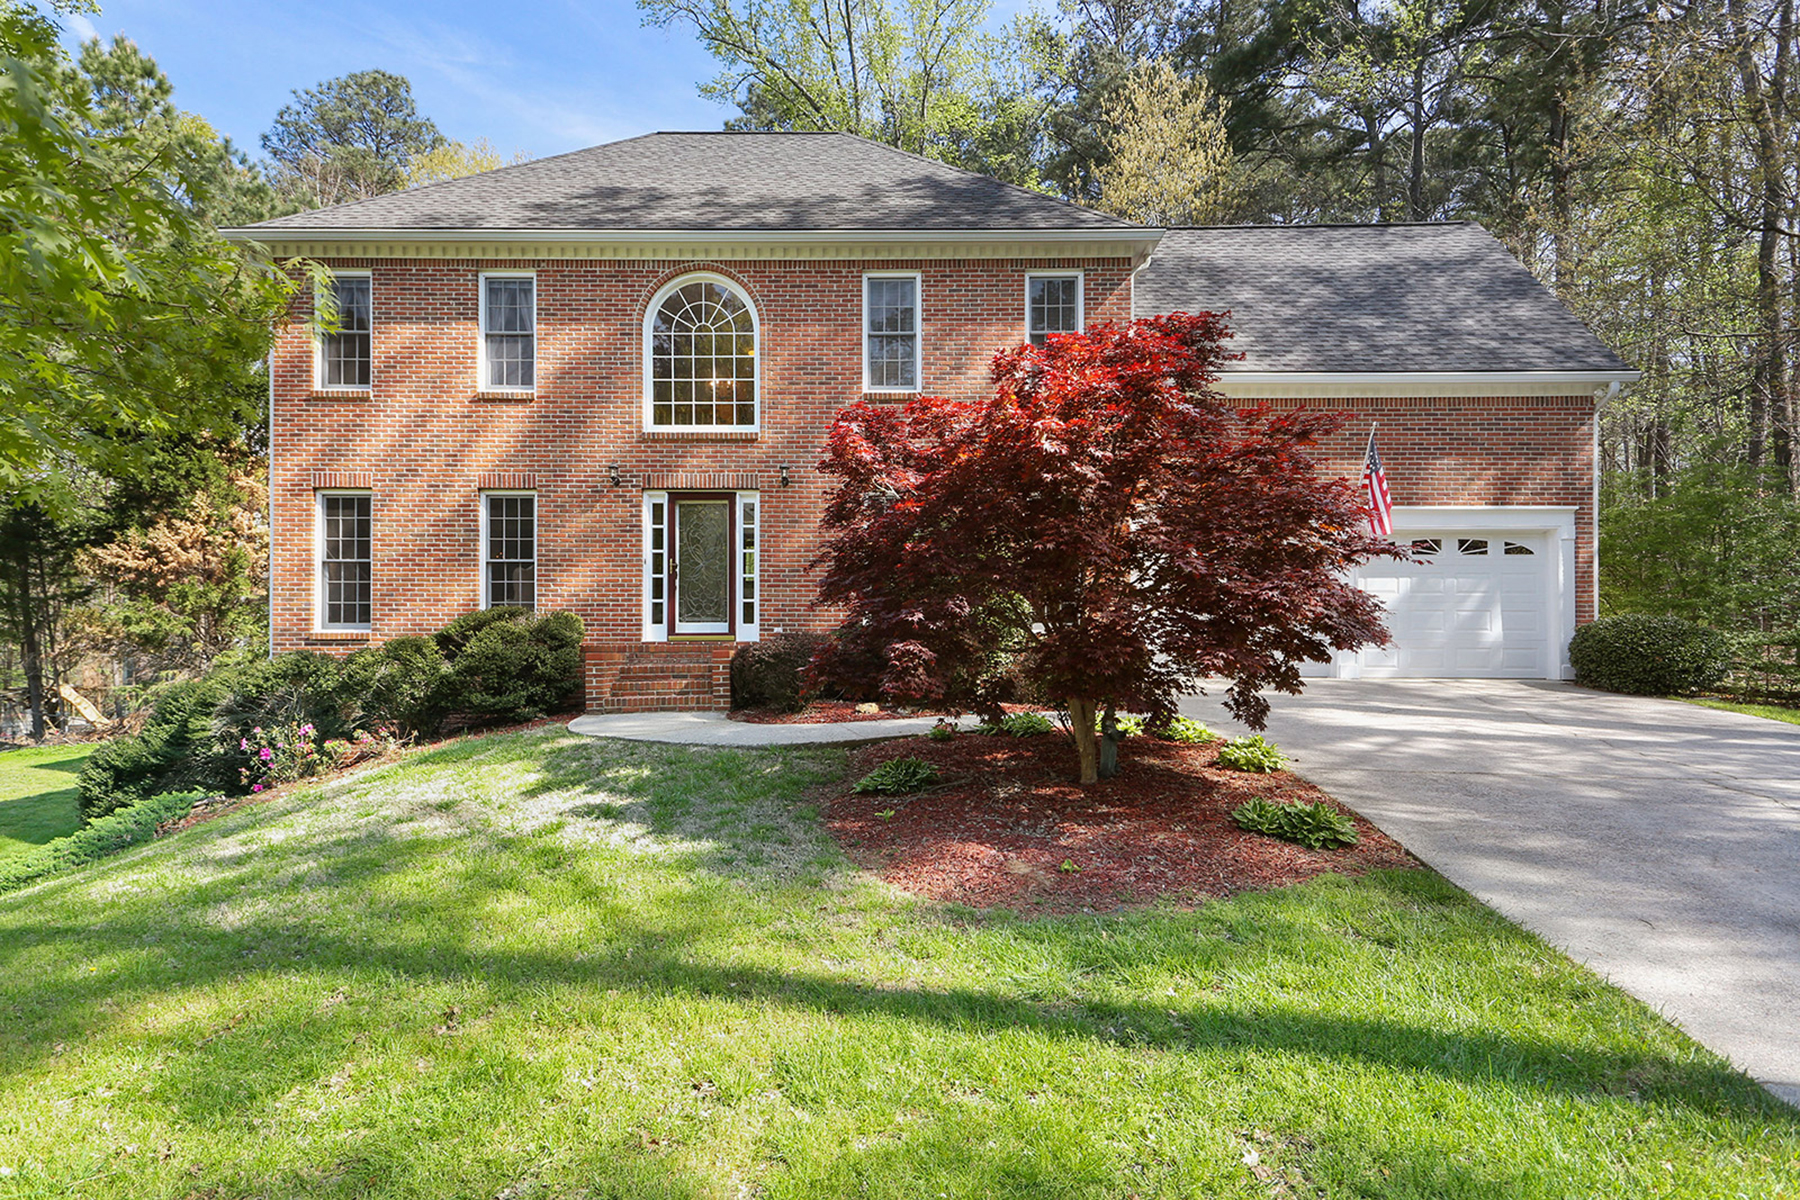 Single Family Home for Sale at Hidden Gem In Alpharetta 5355 Hunters Oaks Drive Alpharetta, Georgia 30009 United States